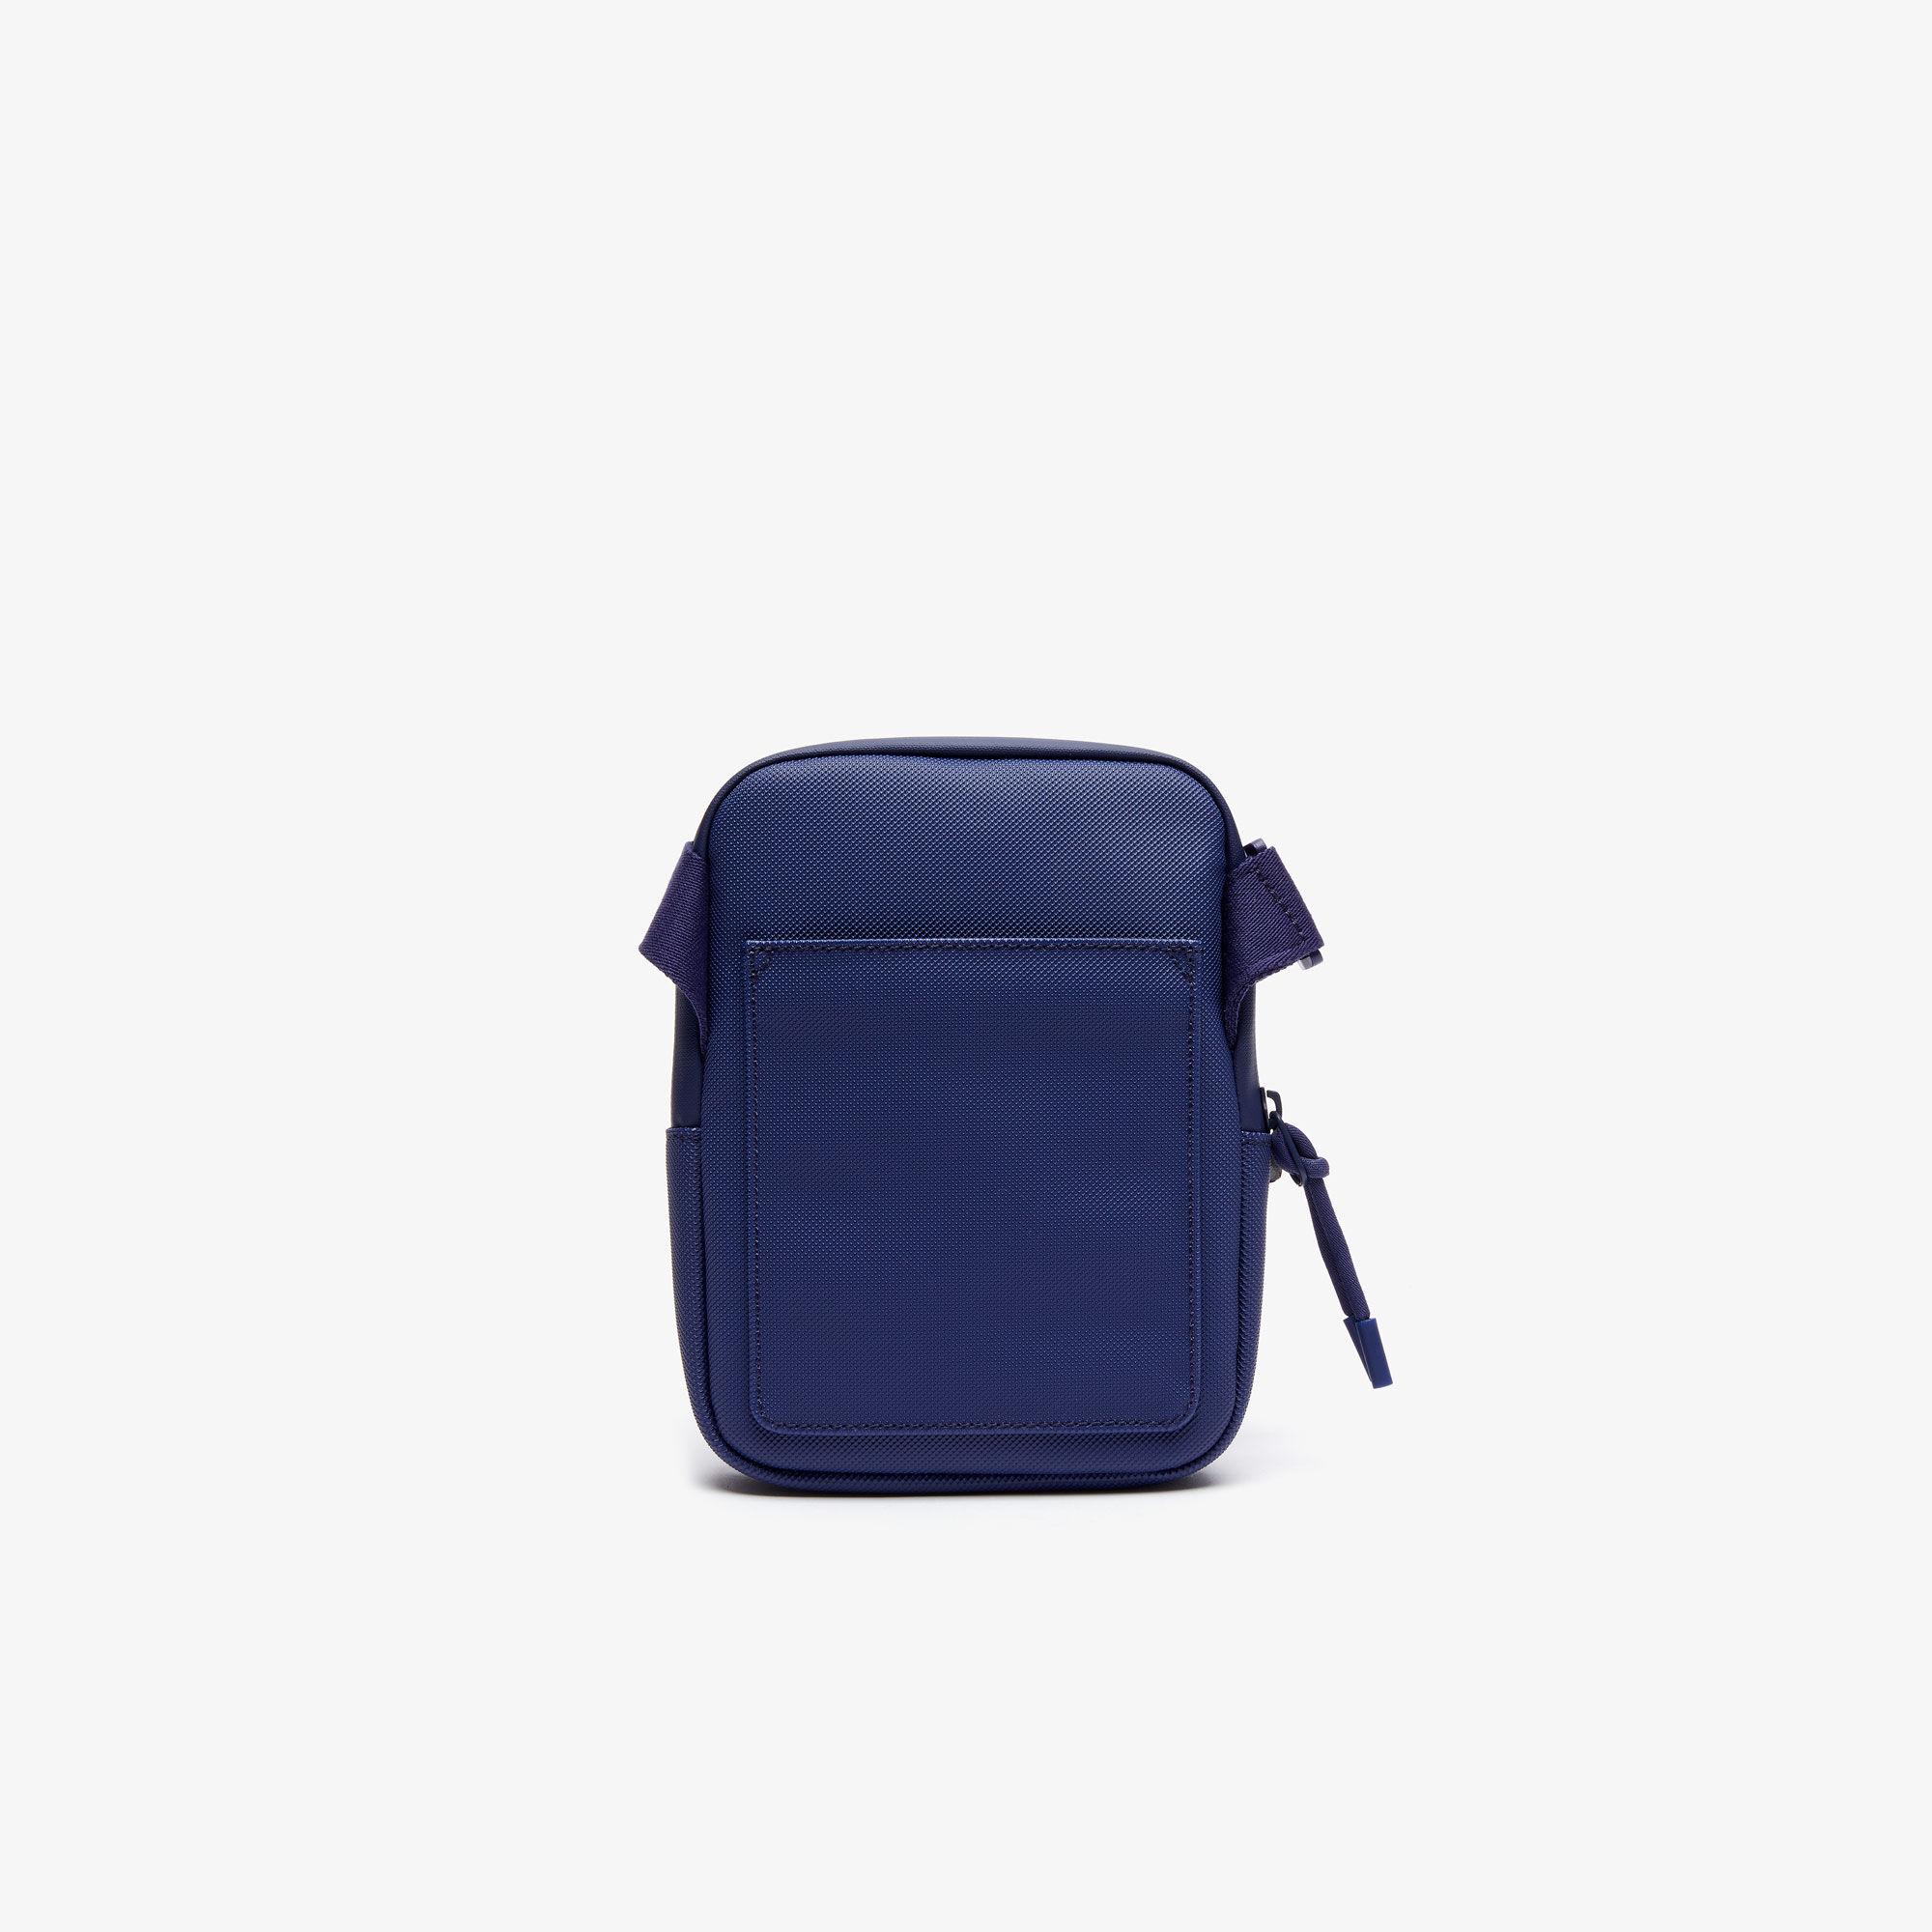 Men's L.12.12 Branded Zippered Small Flat Bag